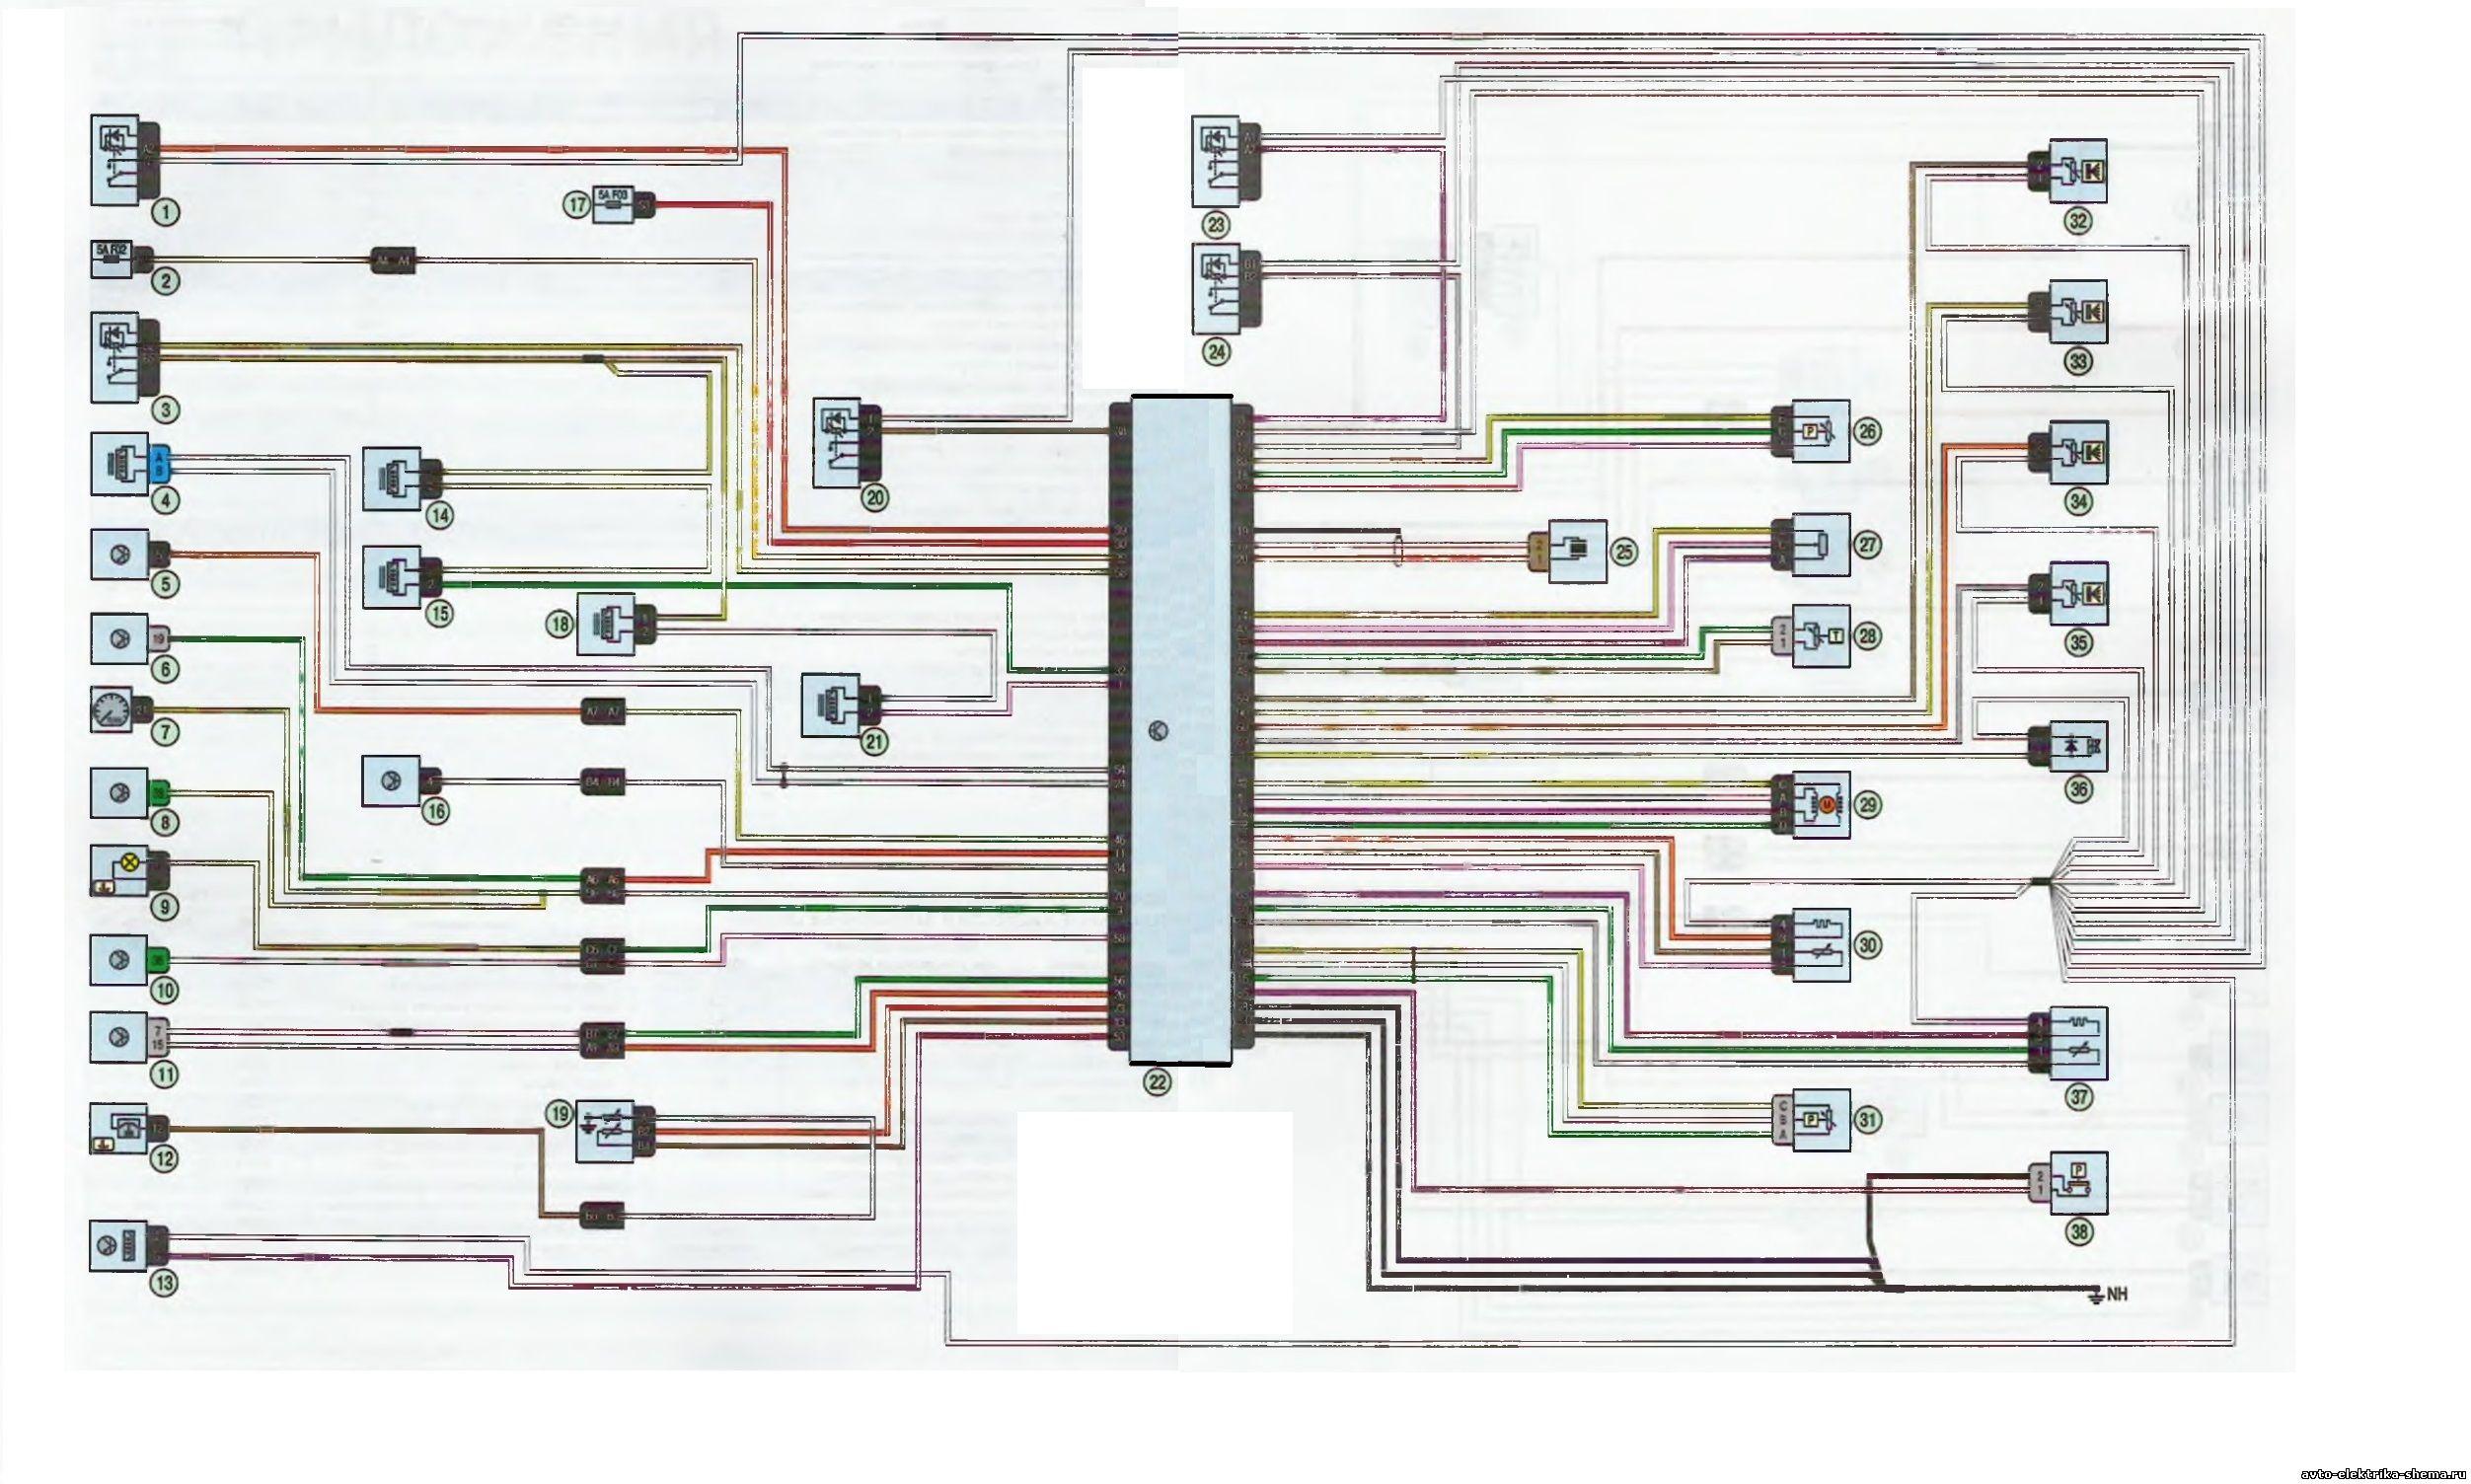 s1 - Схема центрального замка ларгус